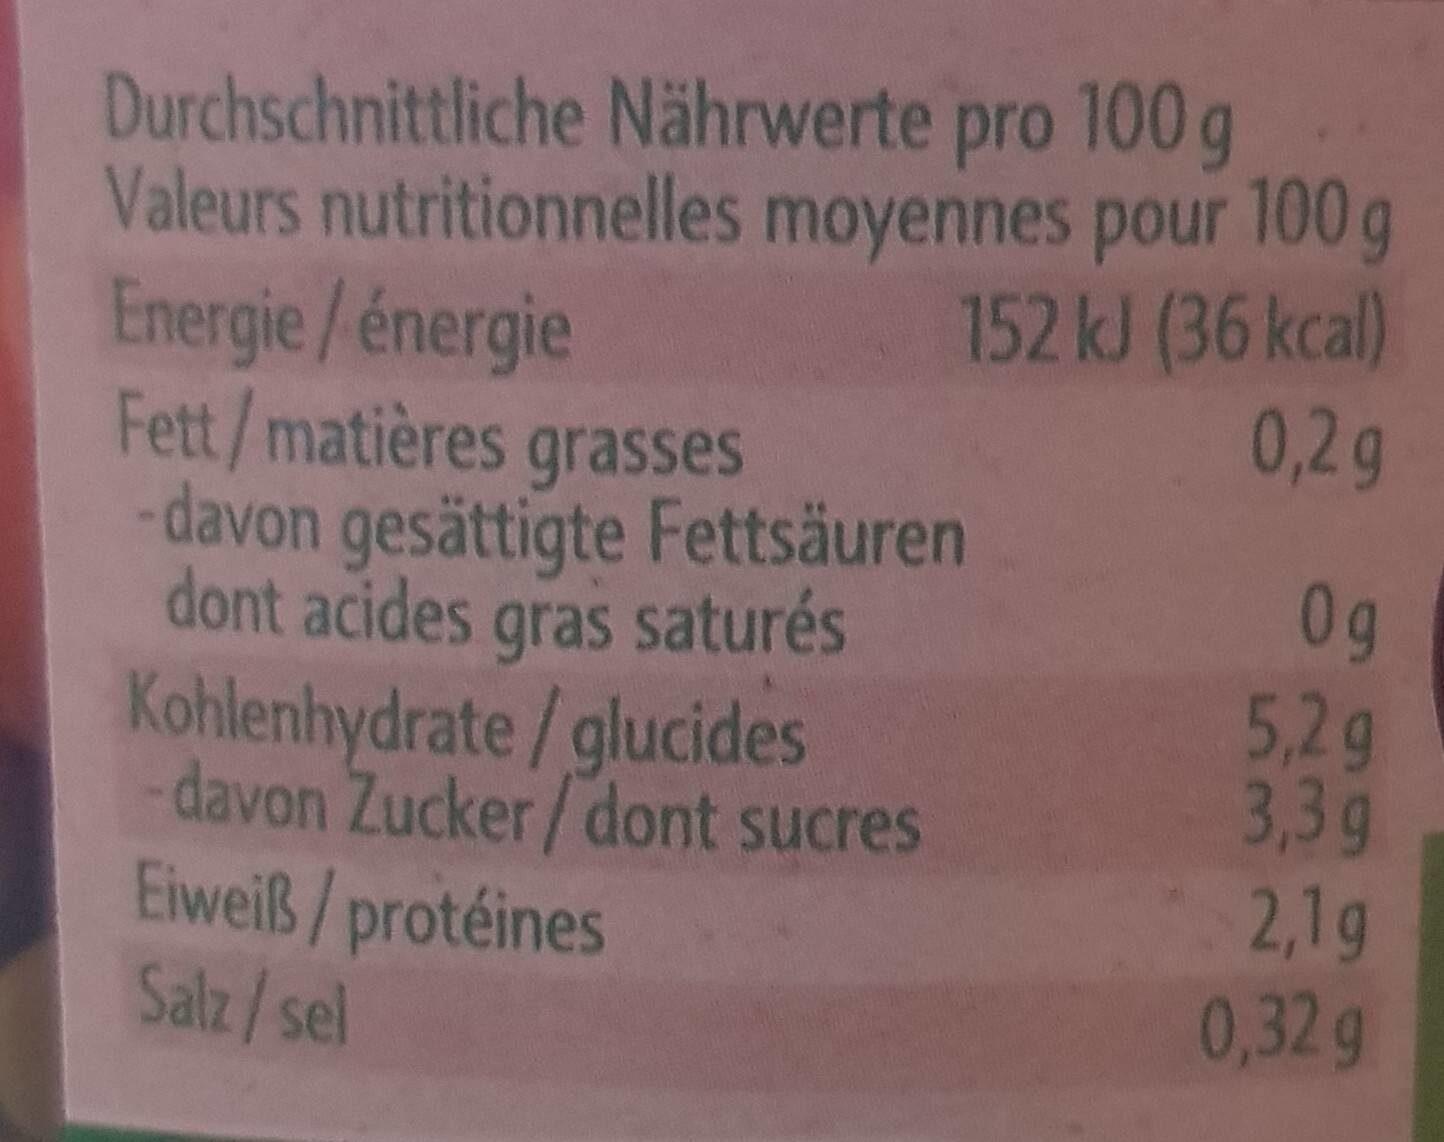 Erbsen & Möhren - Nährwertangaben - de